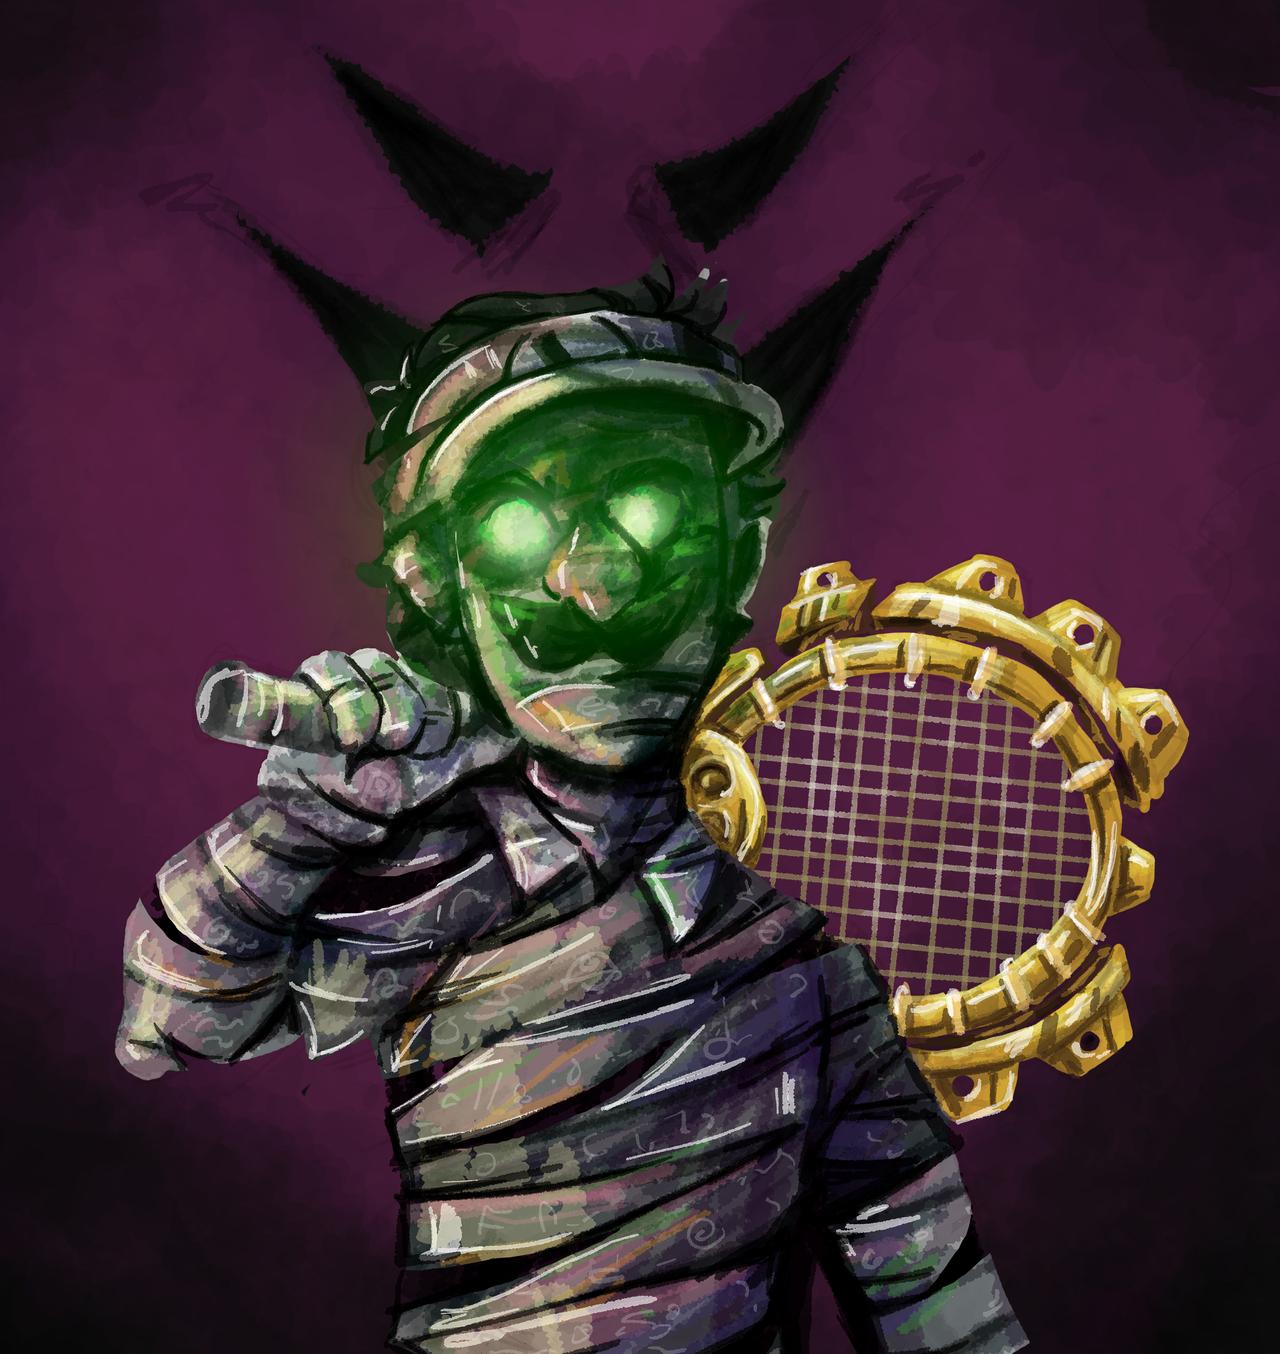 Dark Luigi Racket Mario Tennis Know Your Meme